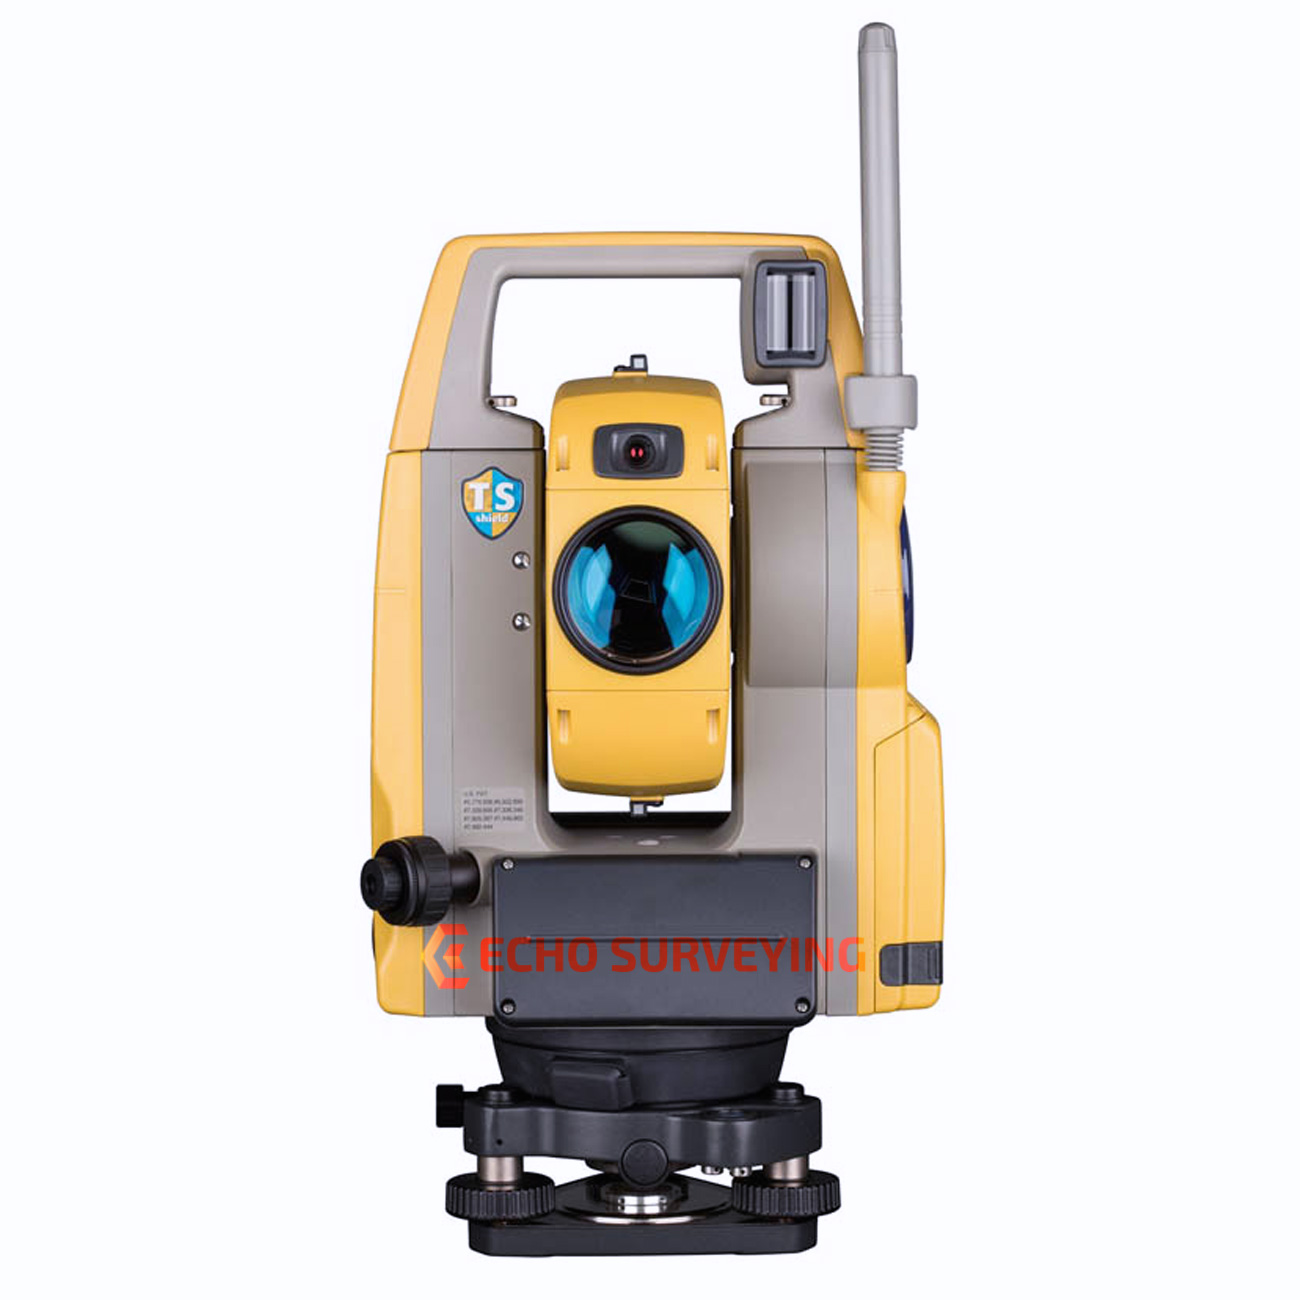 Topcon-DS-200i-Robotic-Total-Station.jpg